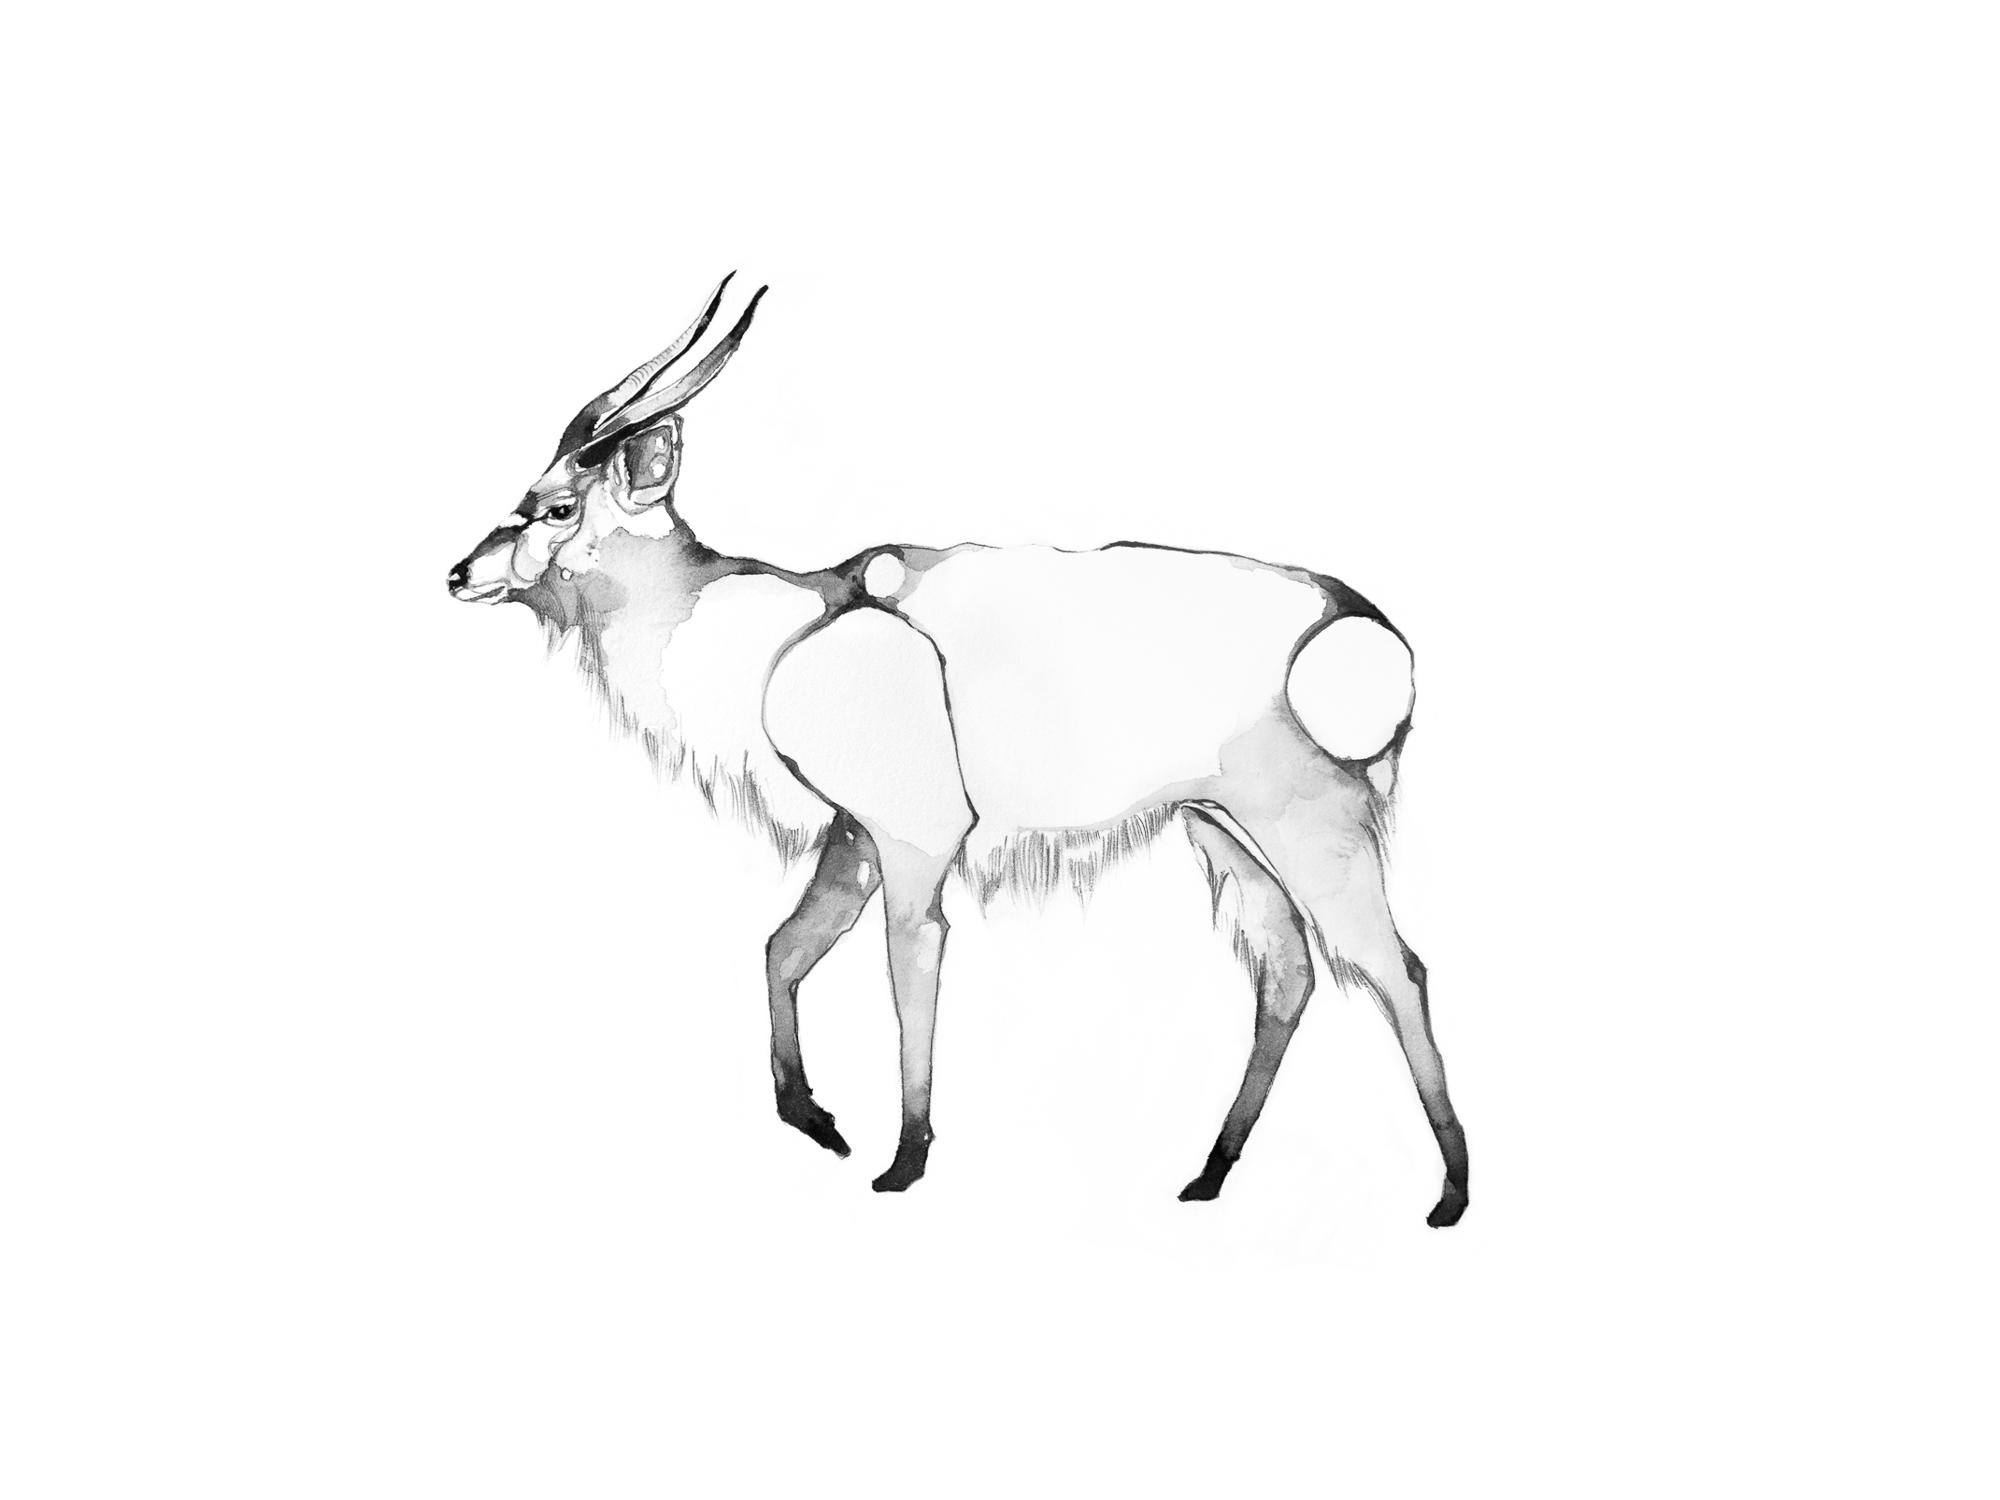 5-Bec_Kilpatrick_Illustration_Antlers_WingsANTELOPE